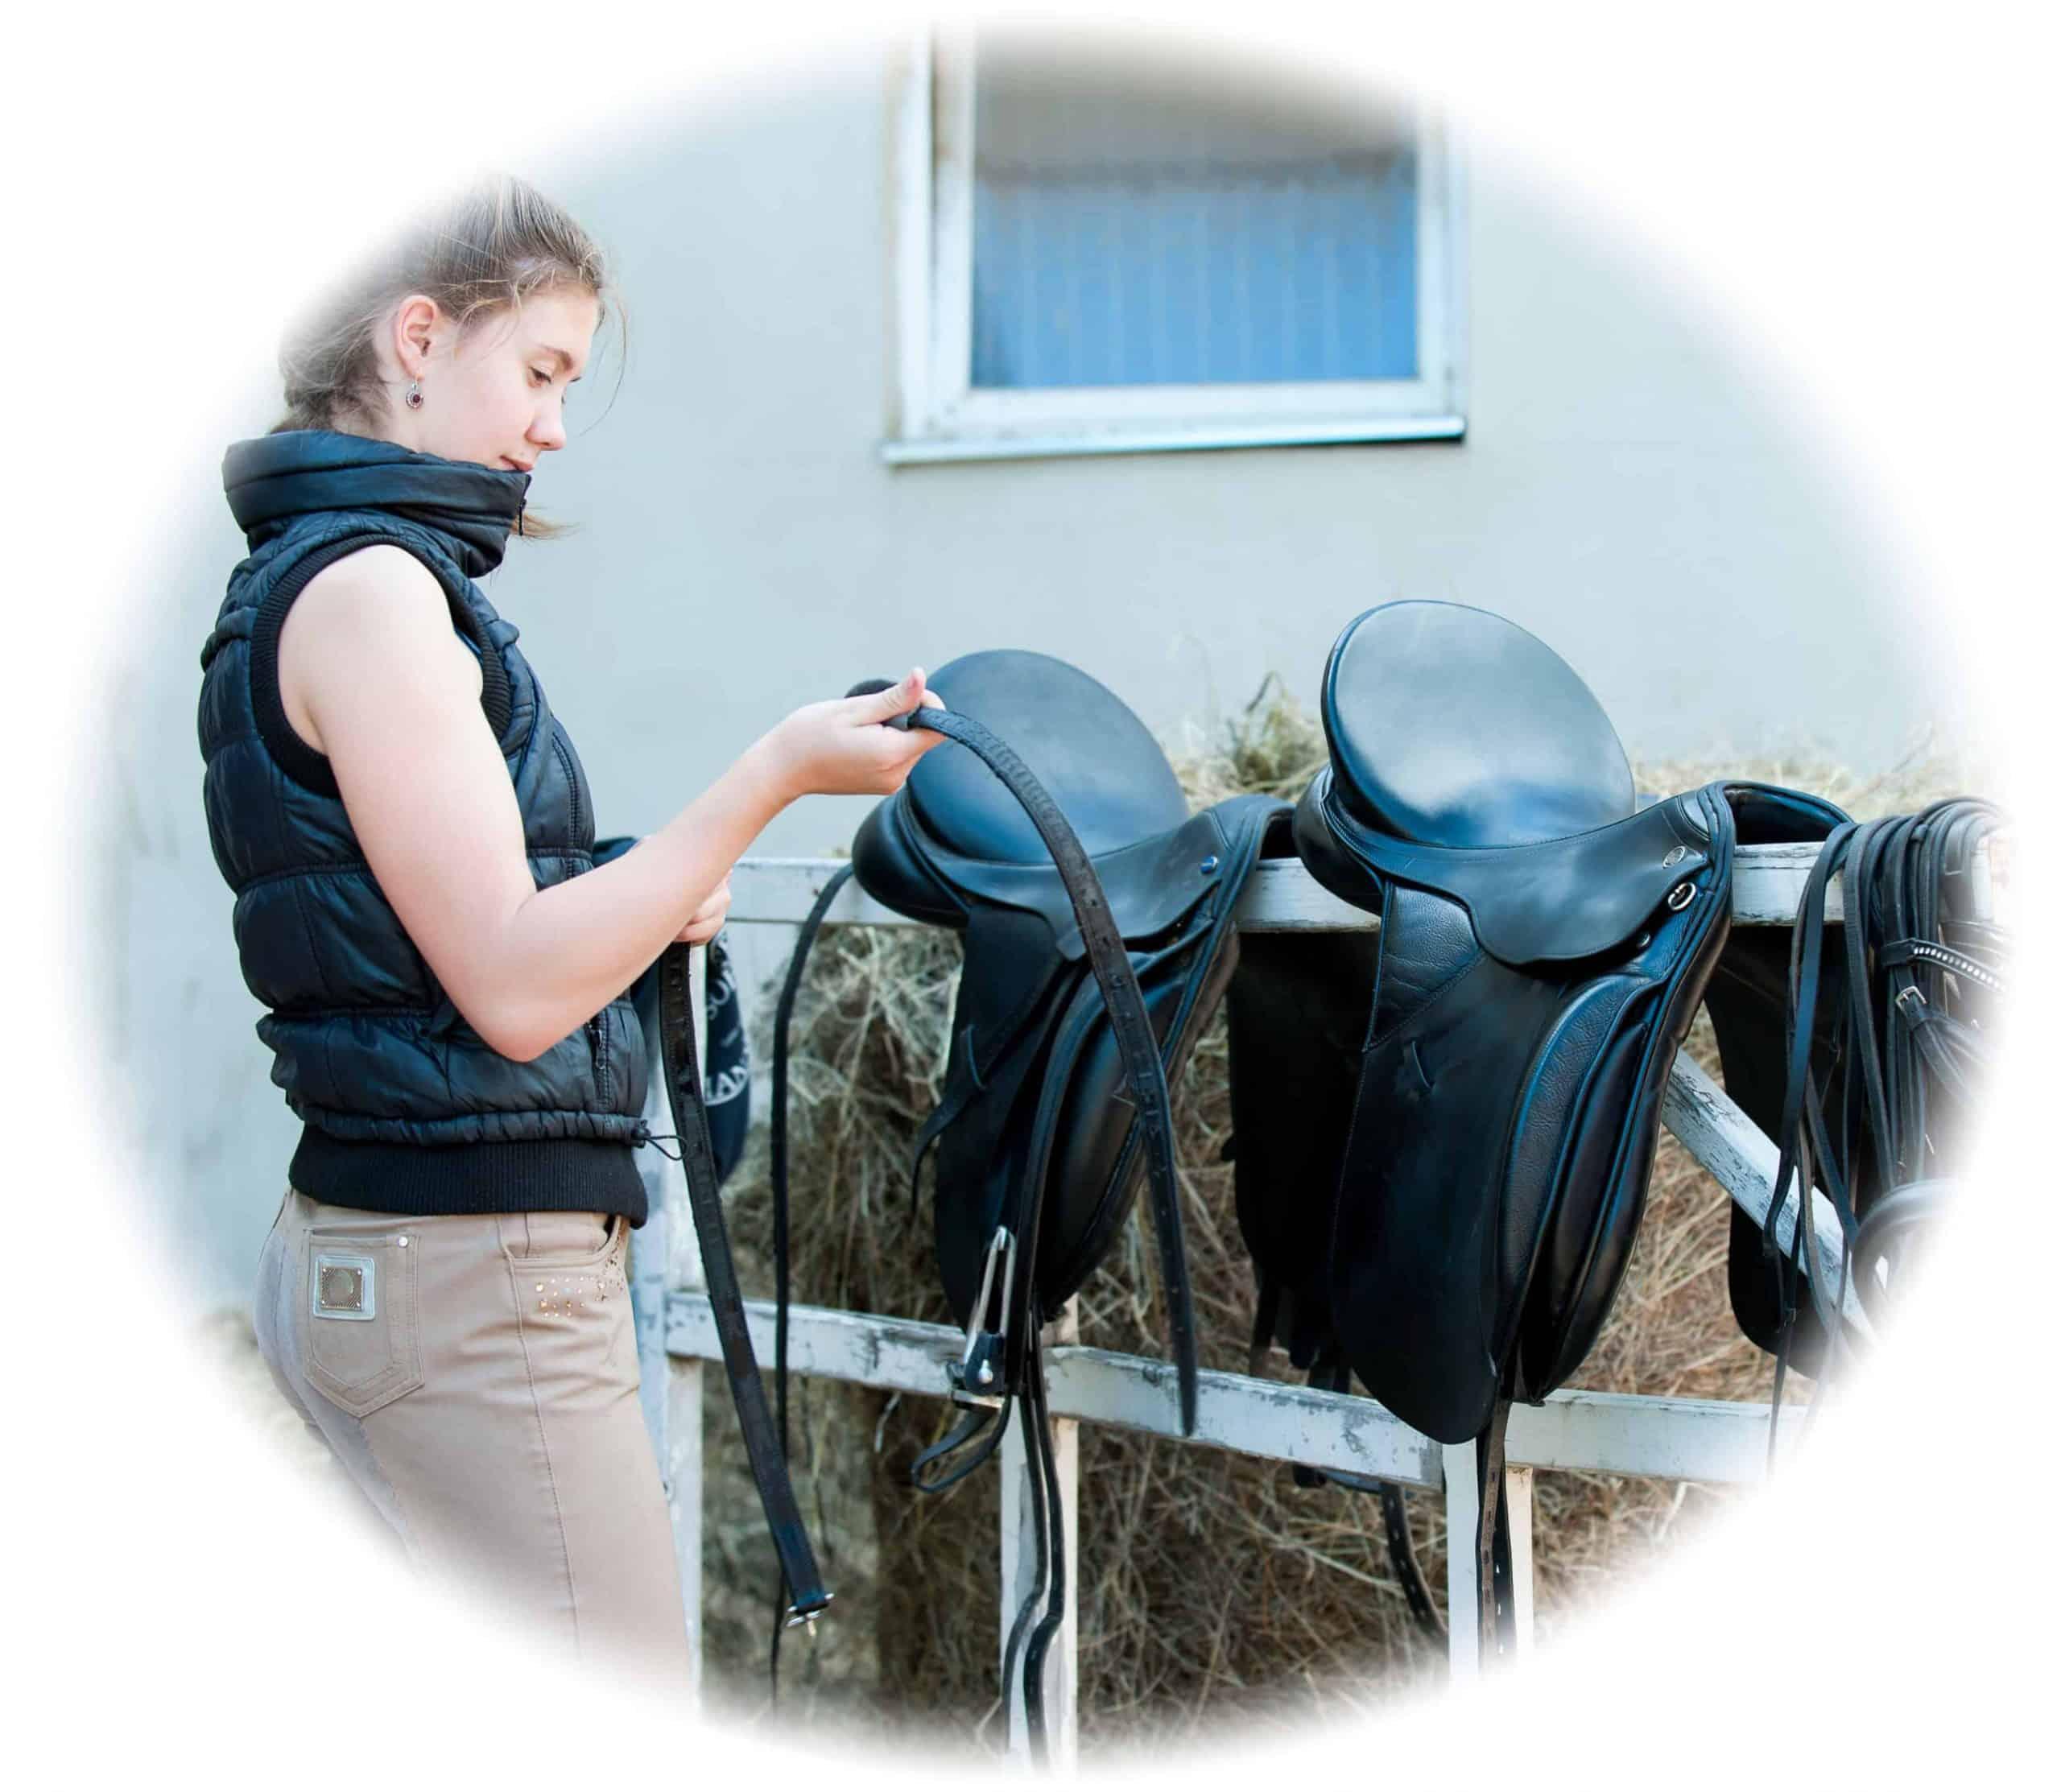 Practical horse care skills - training